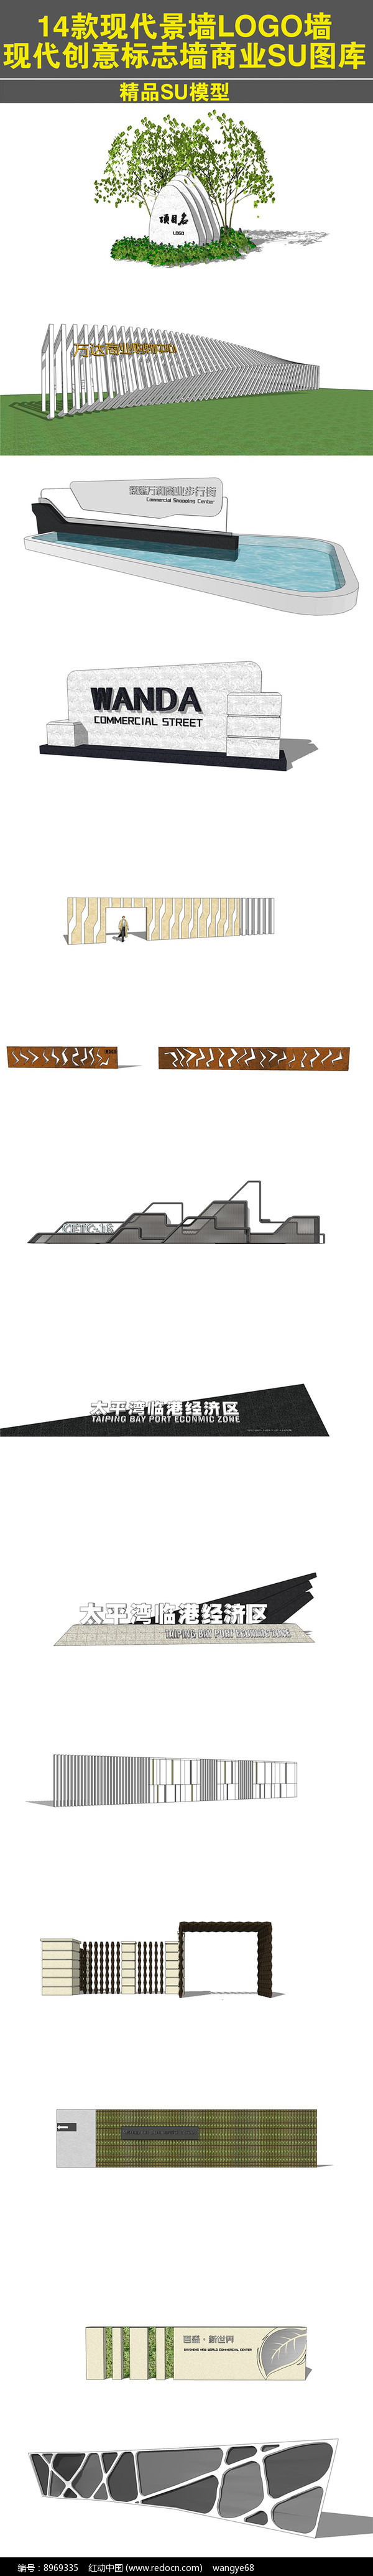 LOGO墙现代创意标志墙图片